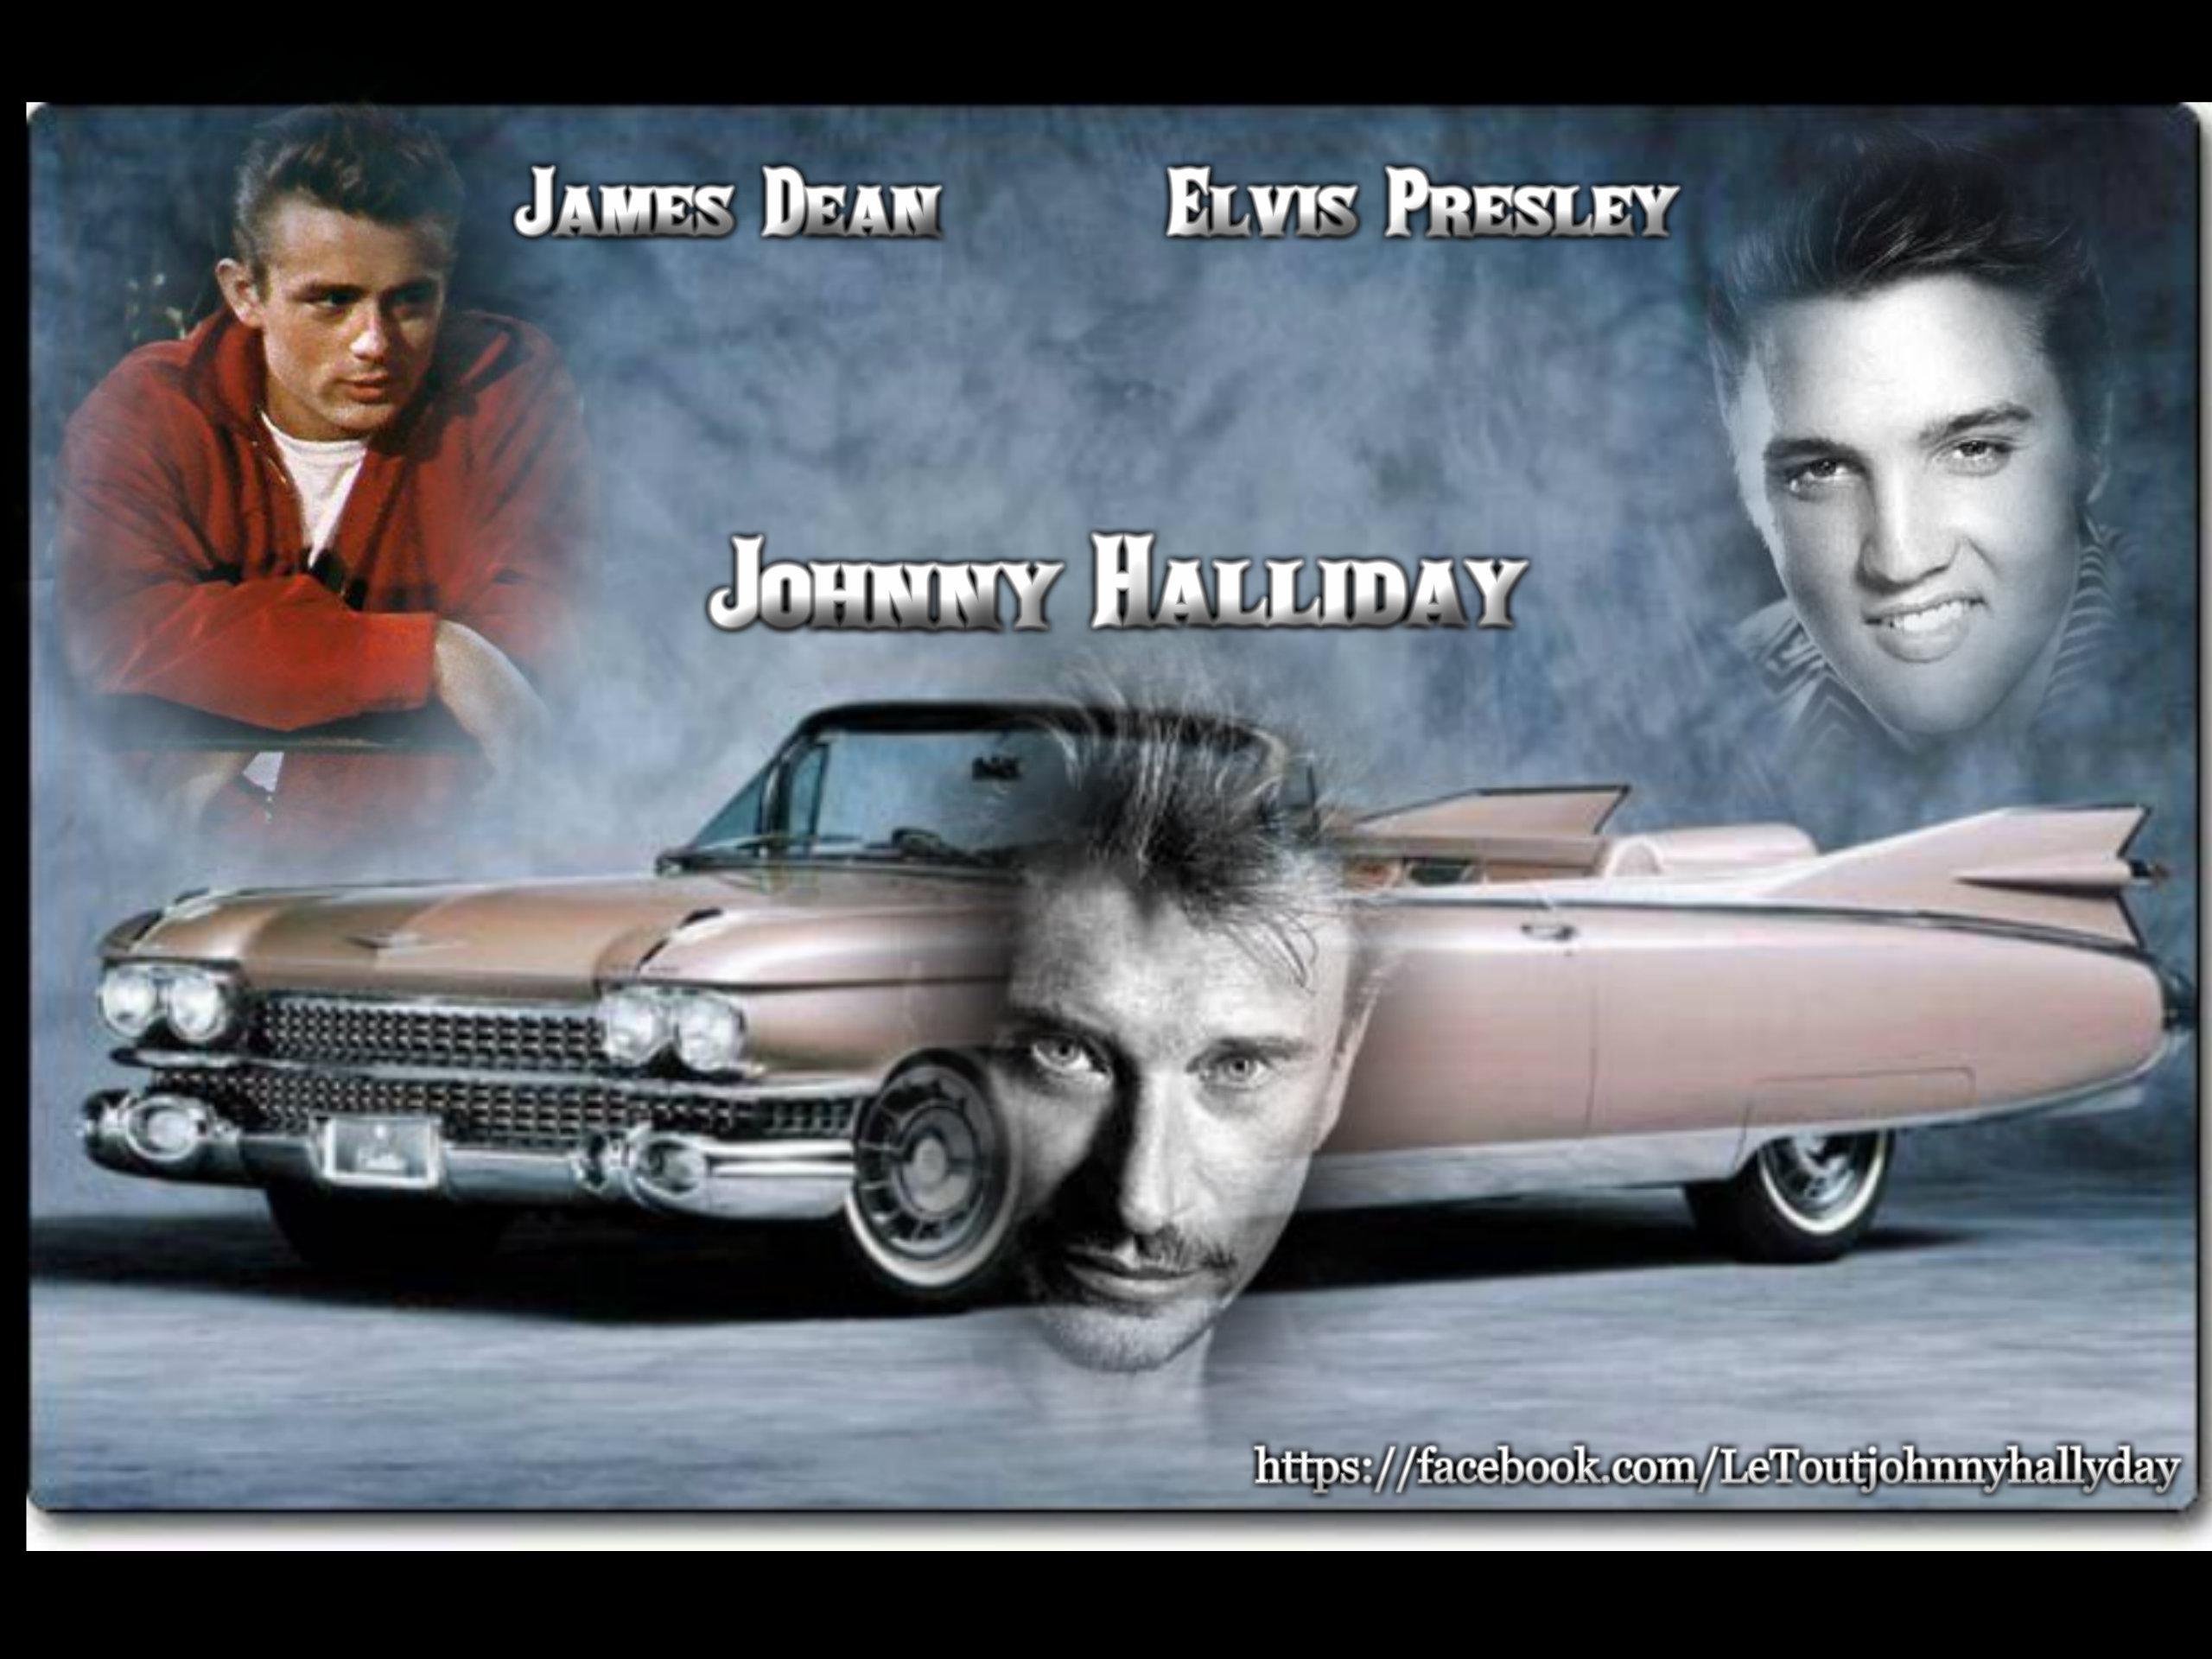 Johnny hallyday rencontre elvis presley